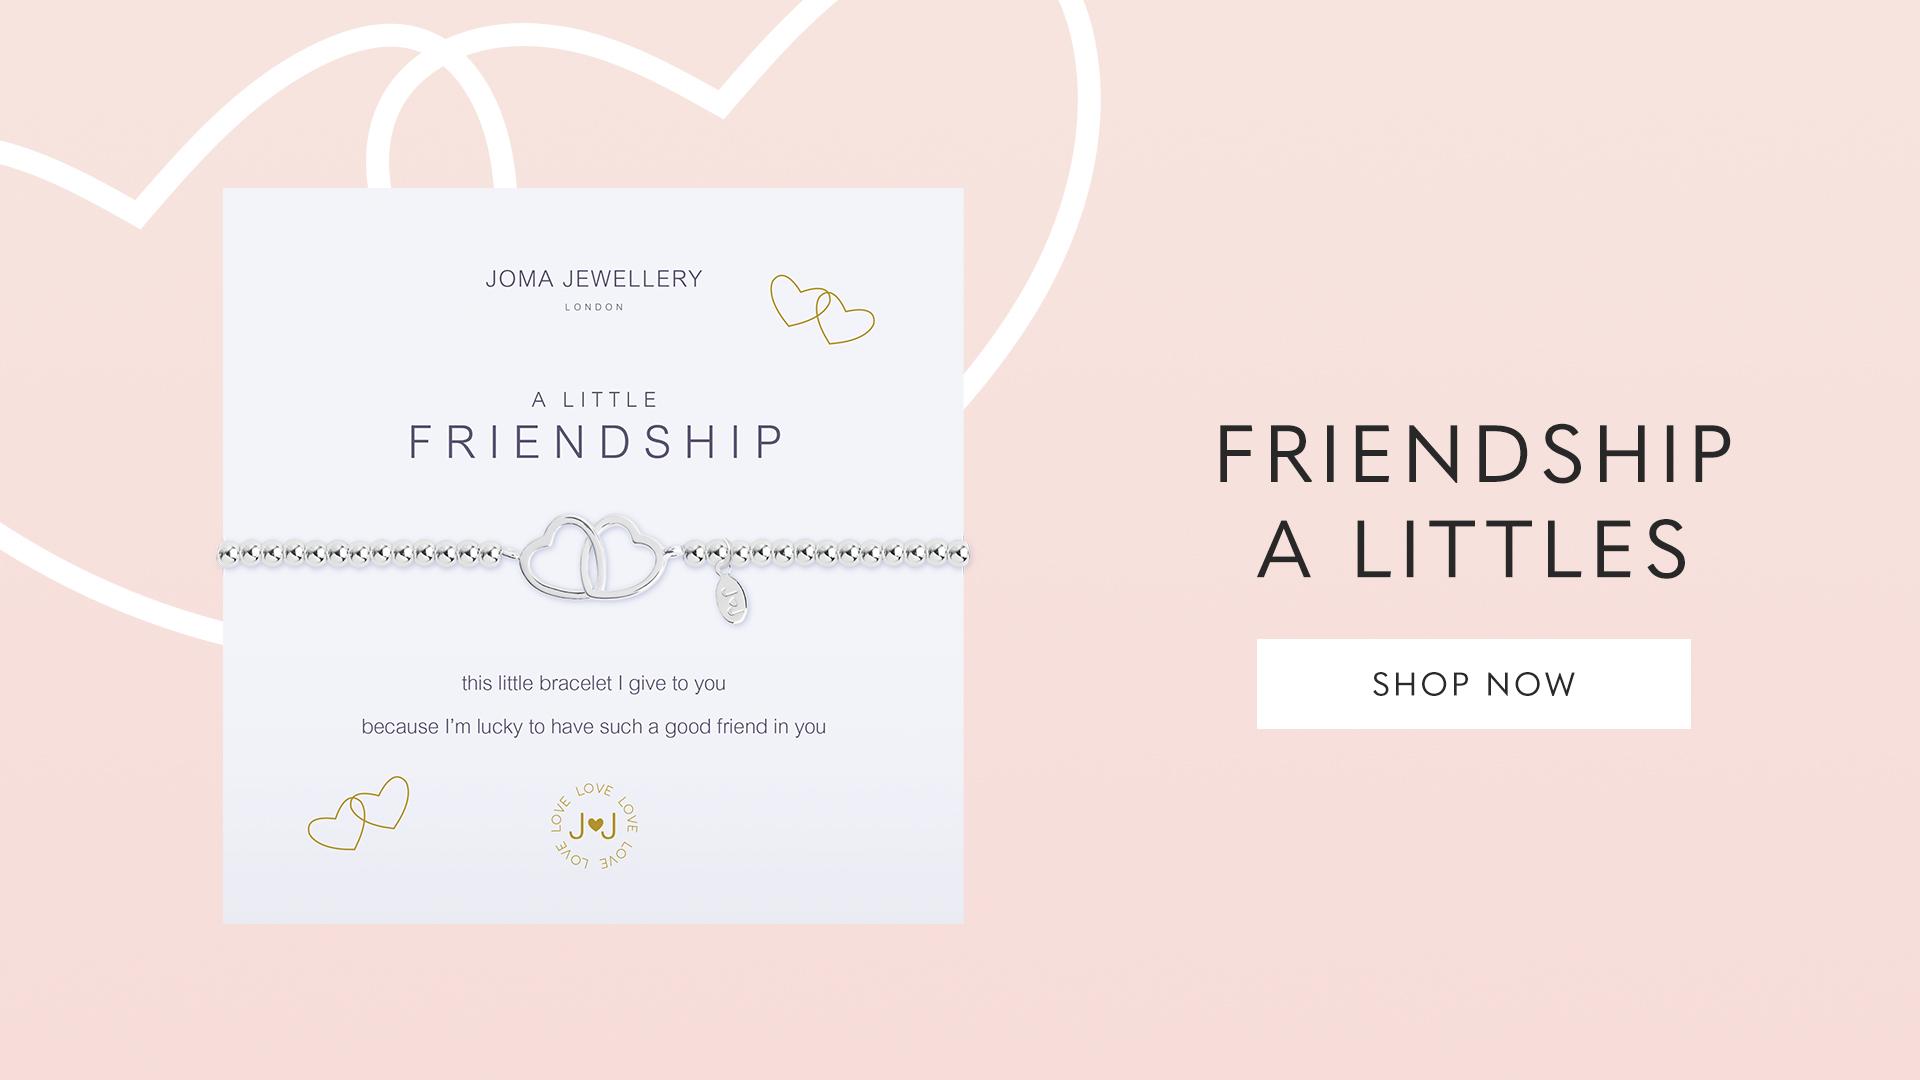 Friendship A Little Bracelets